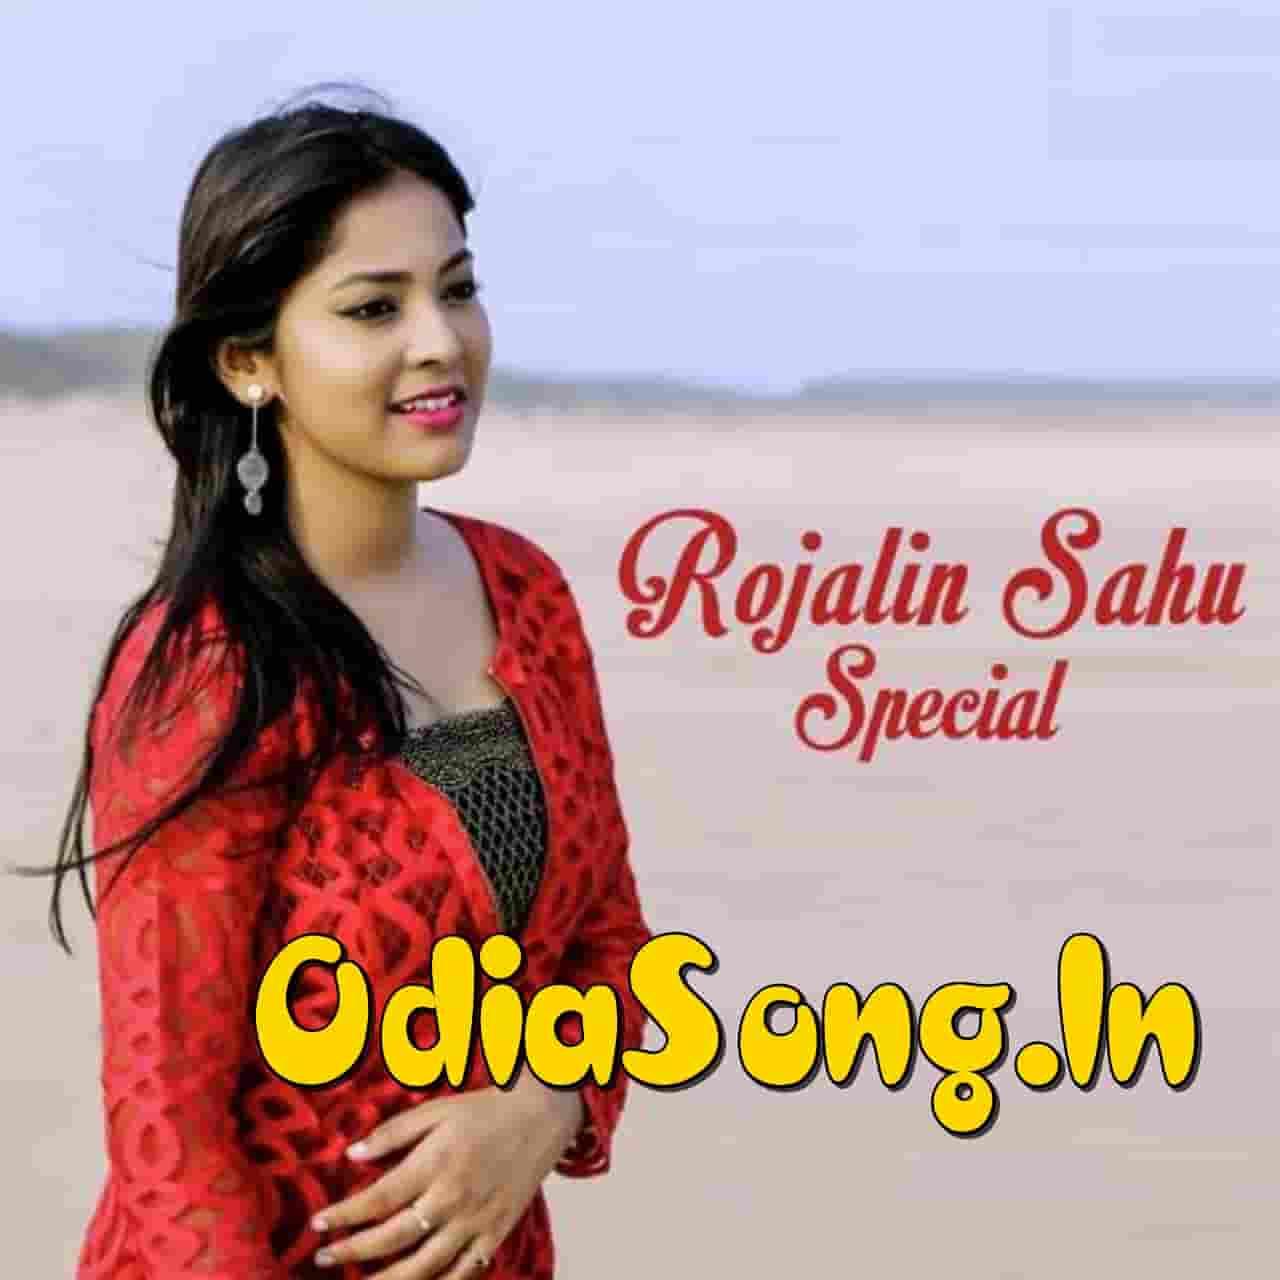 Rangadu - New Oriya Song (Umakant, Rojalin)